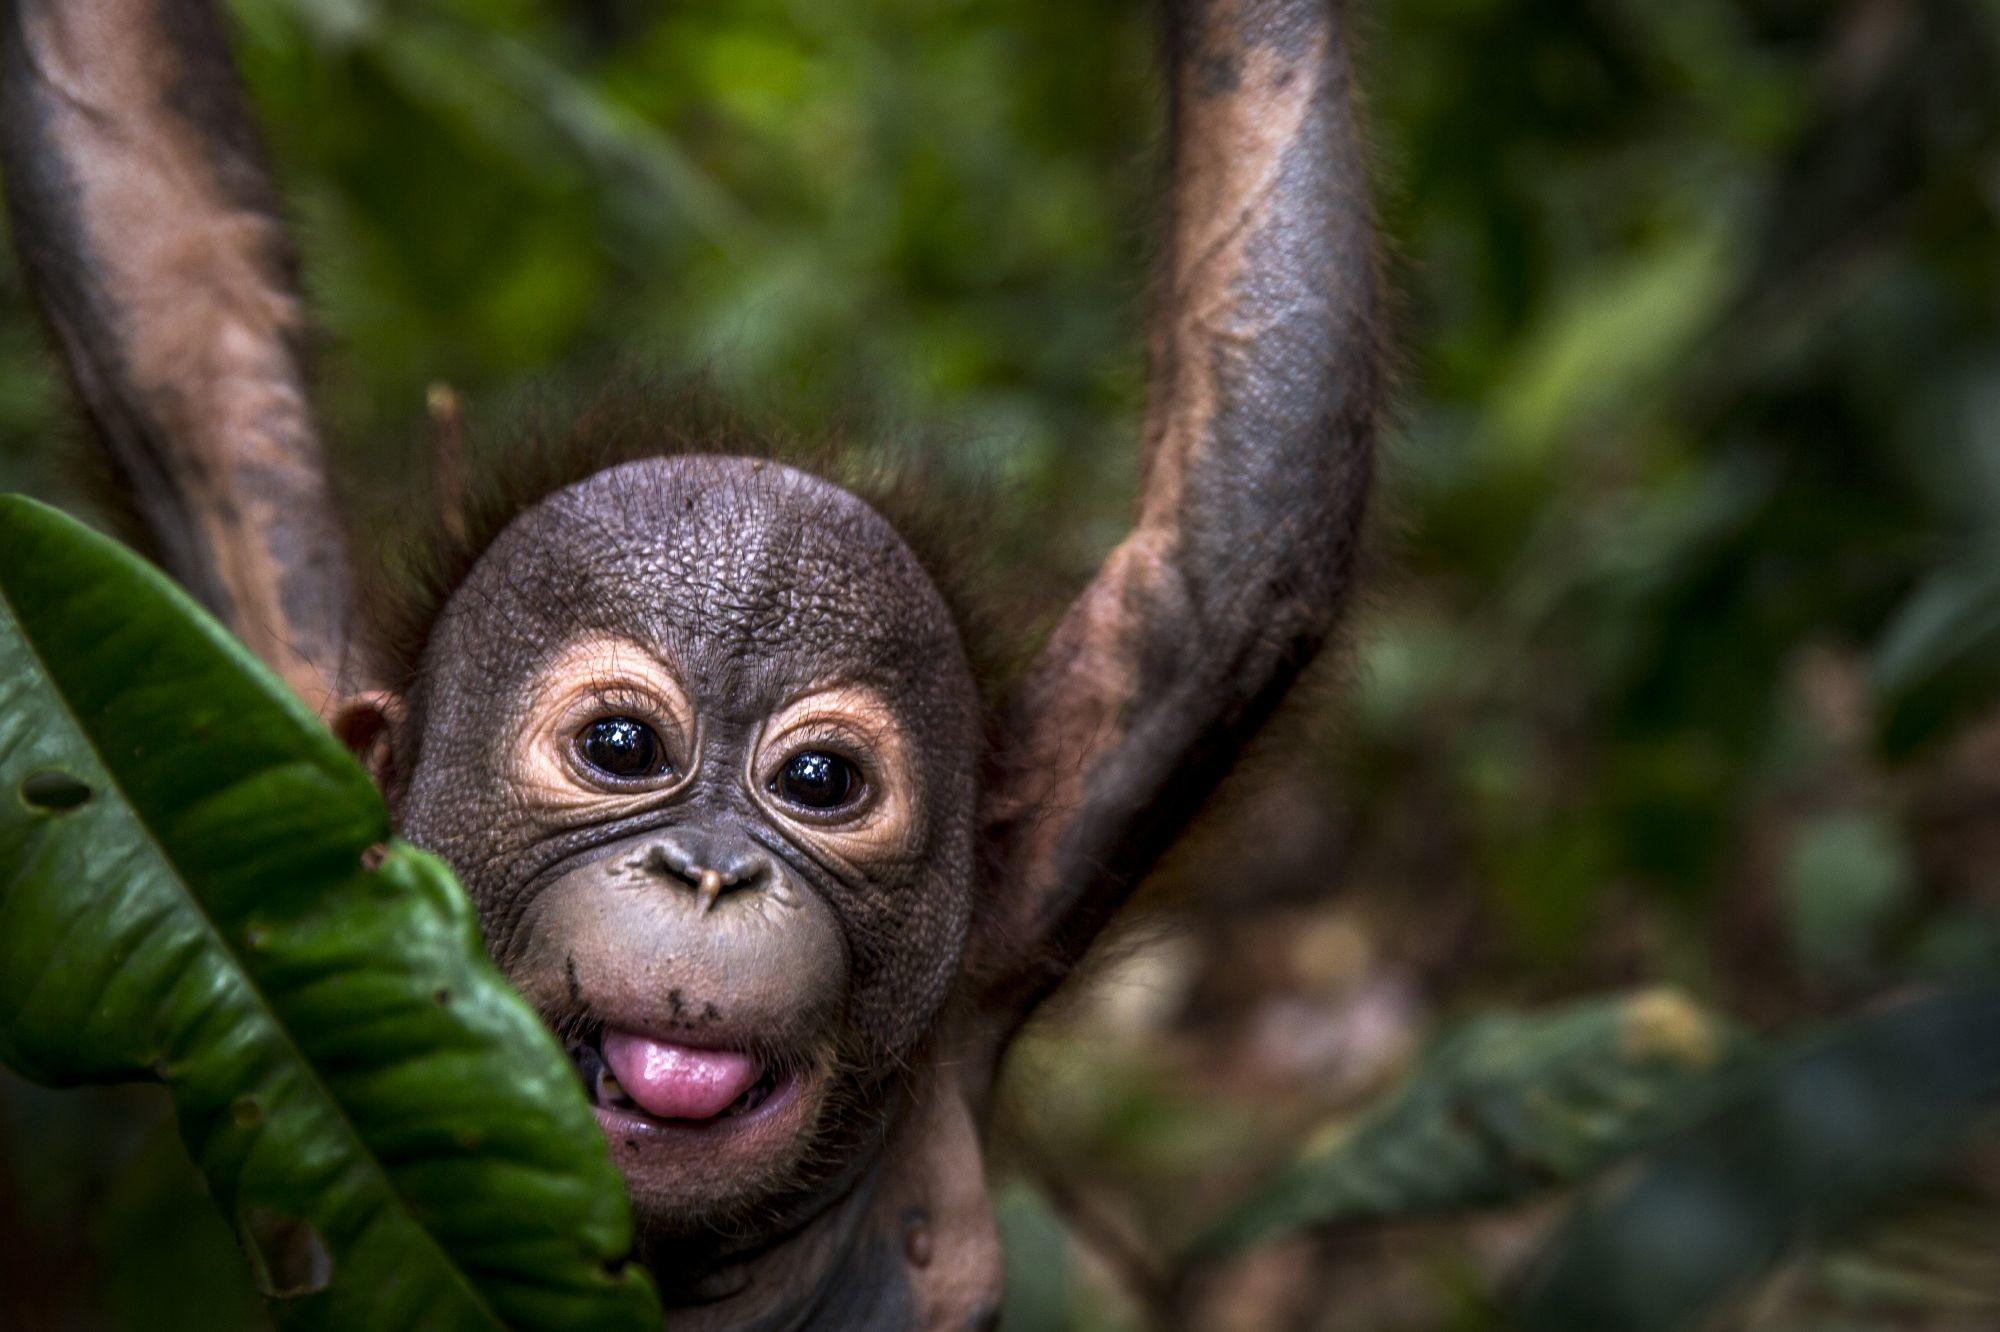 Orang-Utan Gerhana hält sich an einem Ast fest